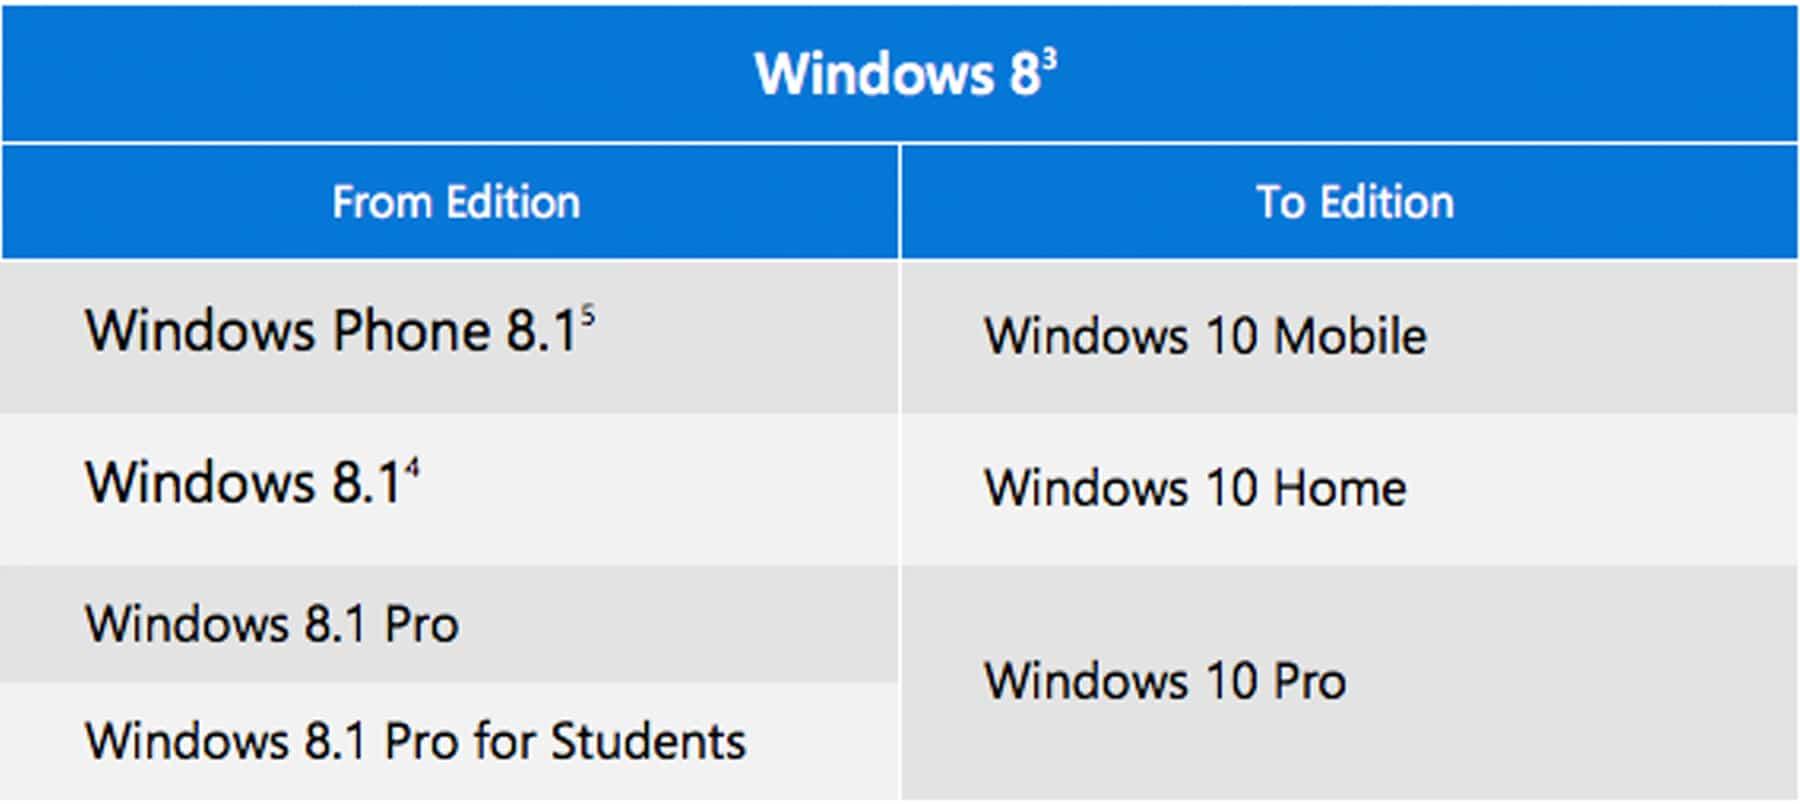 Free Windows 10 Upgrades based on Windows 8